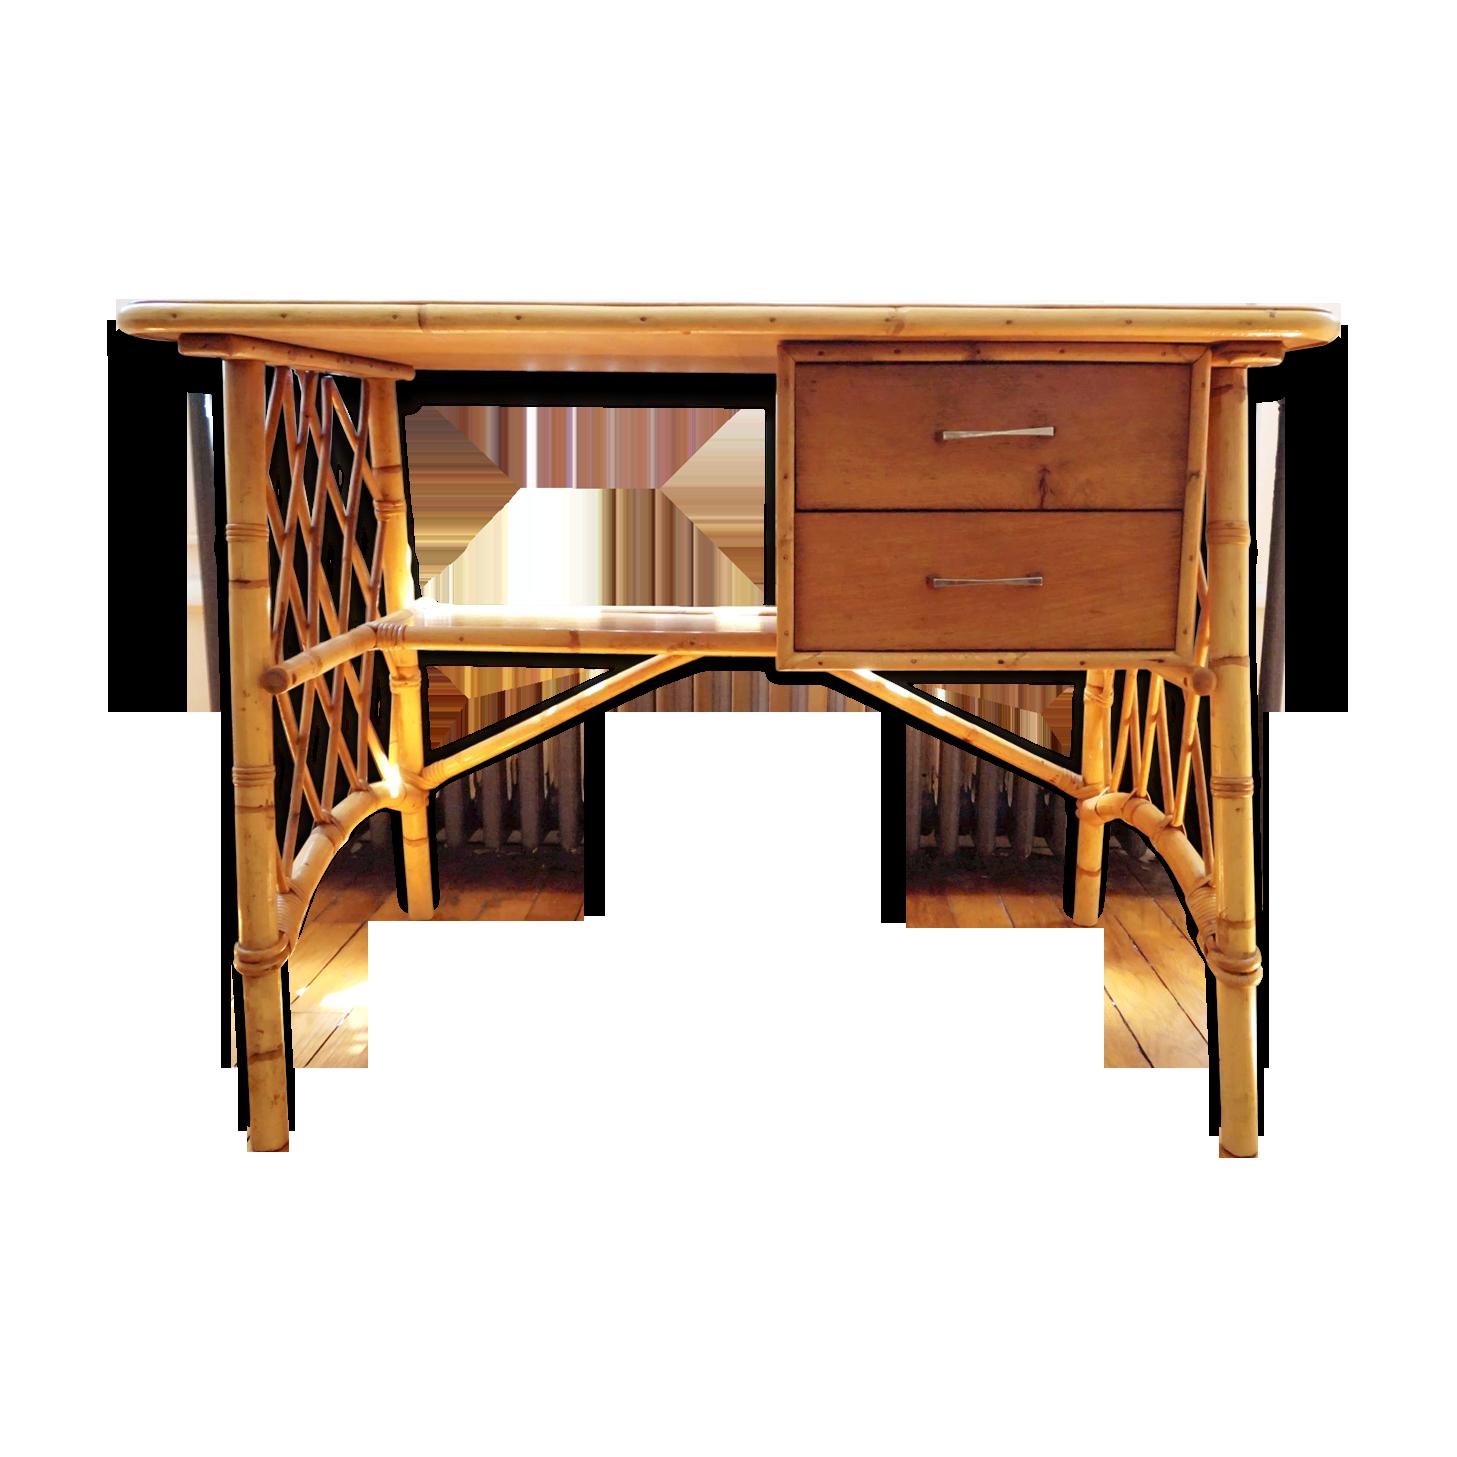 Bureau en rotin avec tiroirs rotin et osier bois couleur